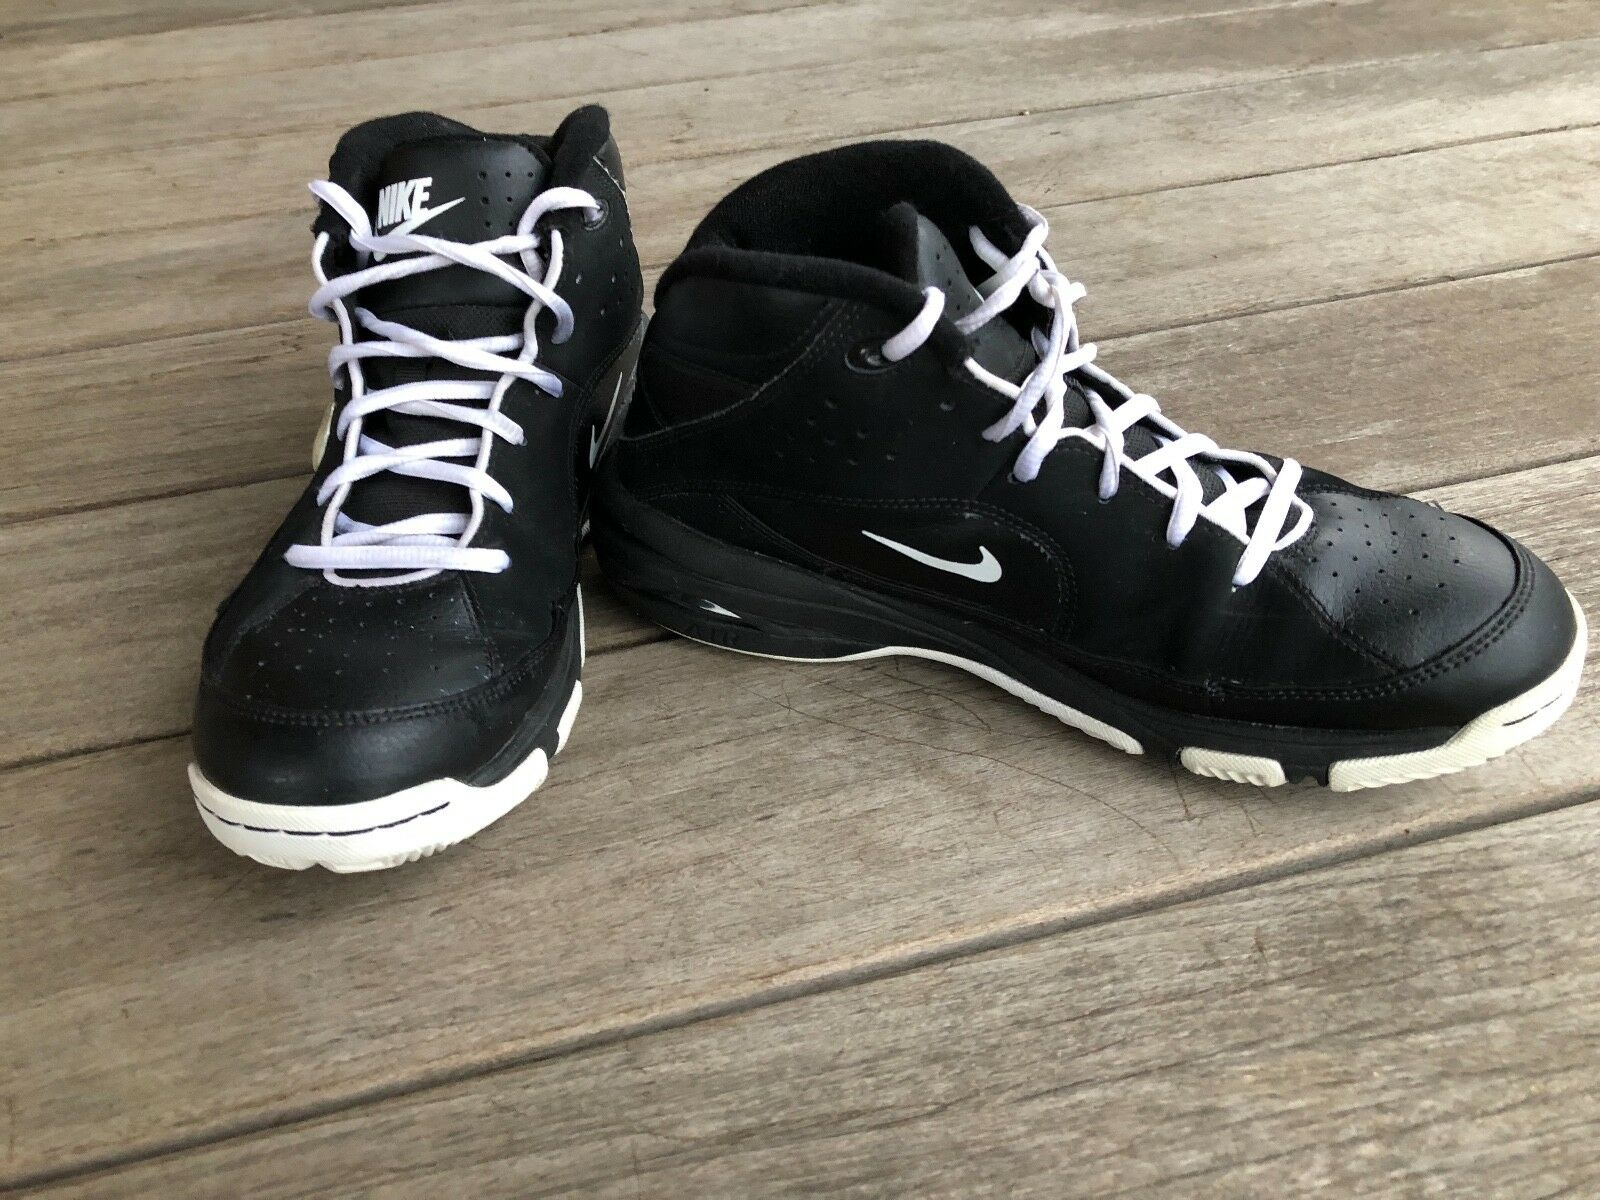 Nike Basketball Shoes  Mens Size US 8.5